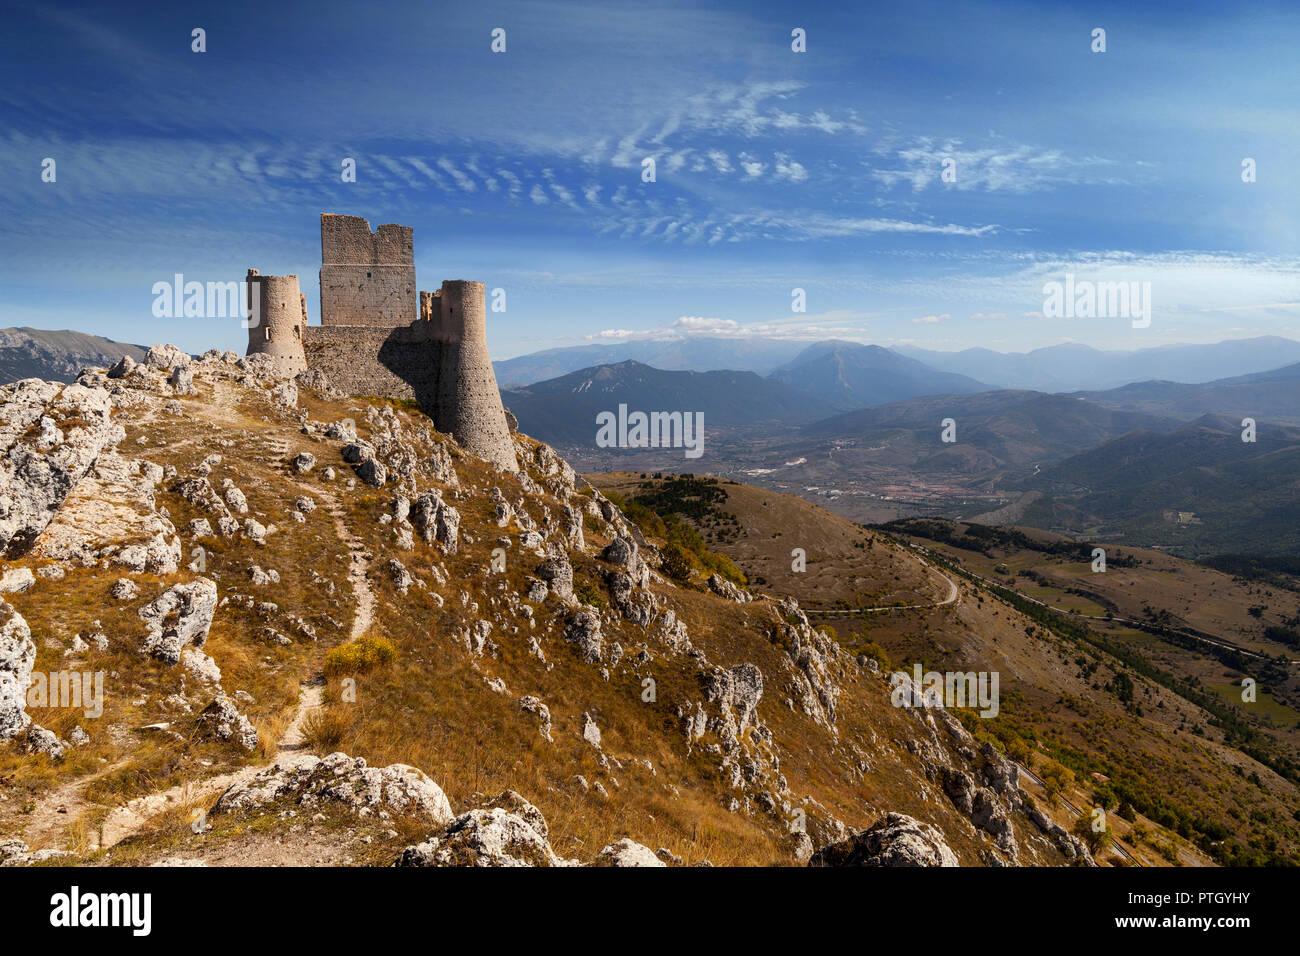 The 10th Century Rocca Calascio, a mountaintop fortress near the hilltown of Santo Stefano di Sessanio in the Province of L'Aquila in Abruzzo, Italy.  - Stock Image